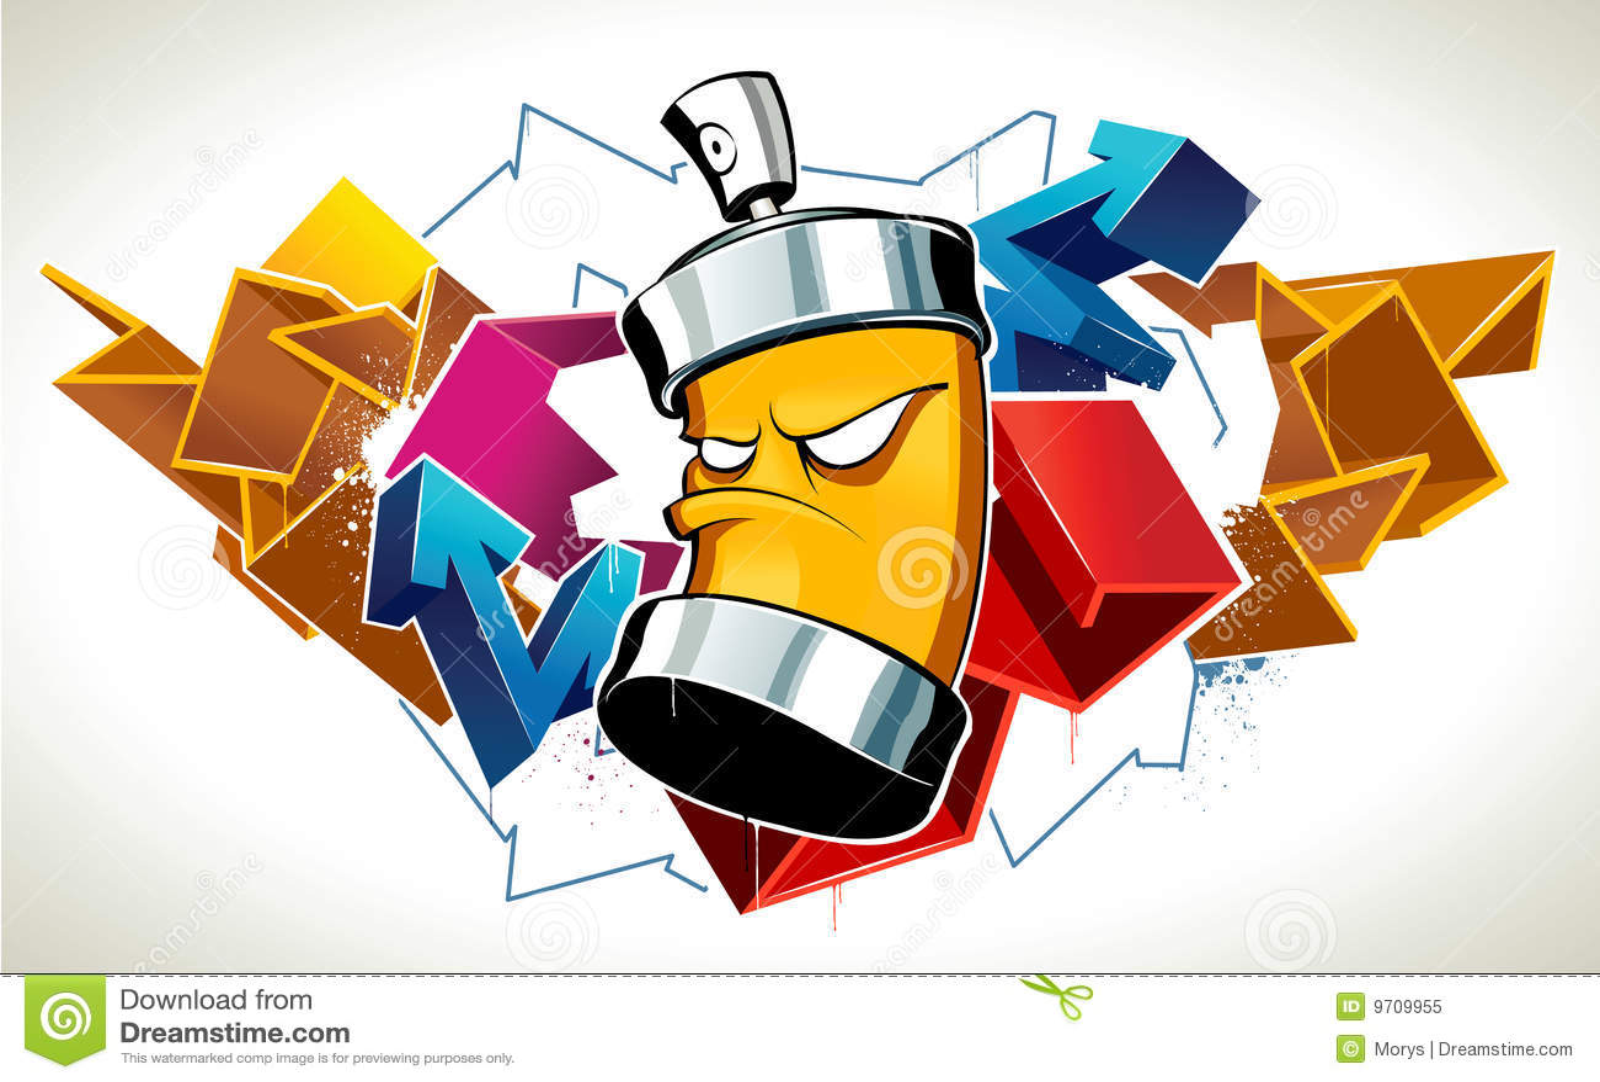 cool graffiti stock vector illustration of graphic graffiti 9709955